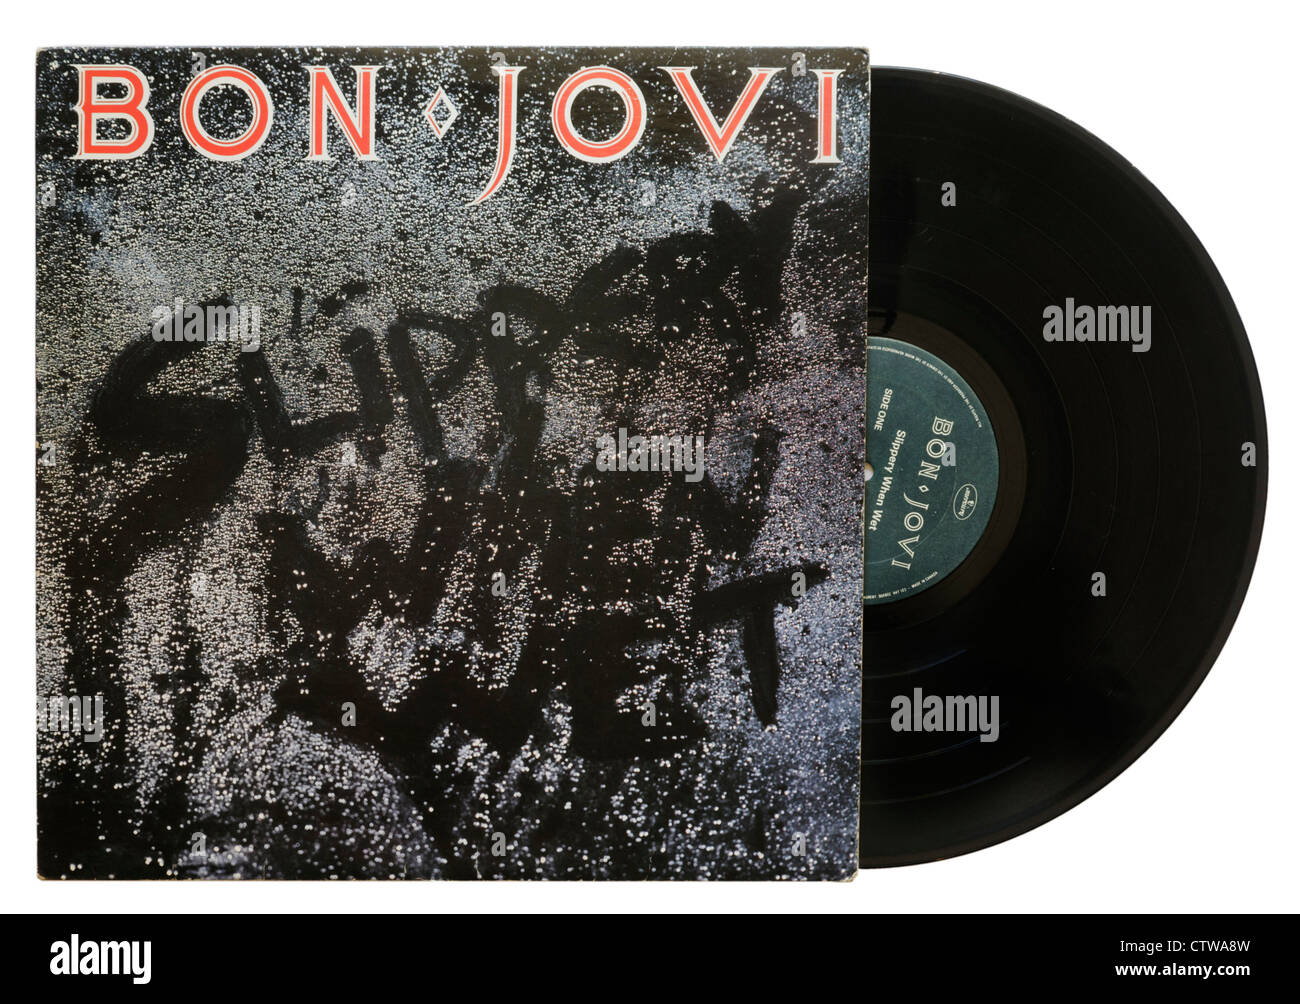 Slippery When Wet by Jon Jovi - Stock Image